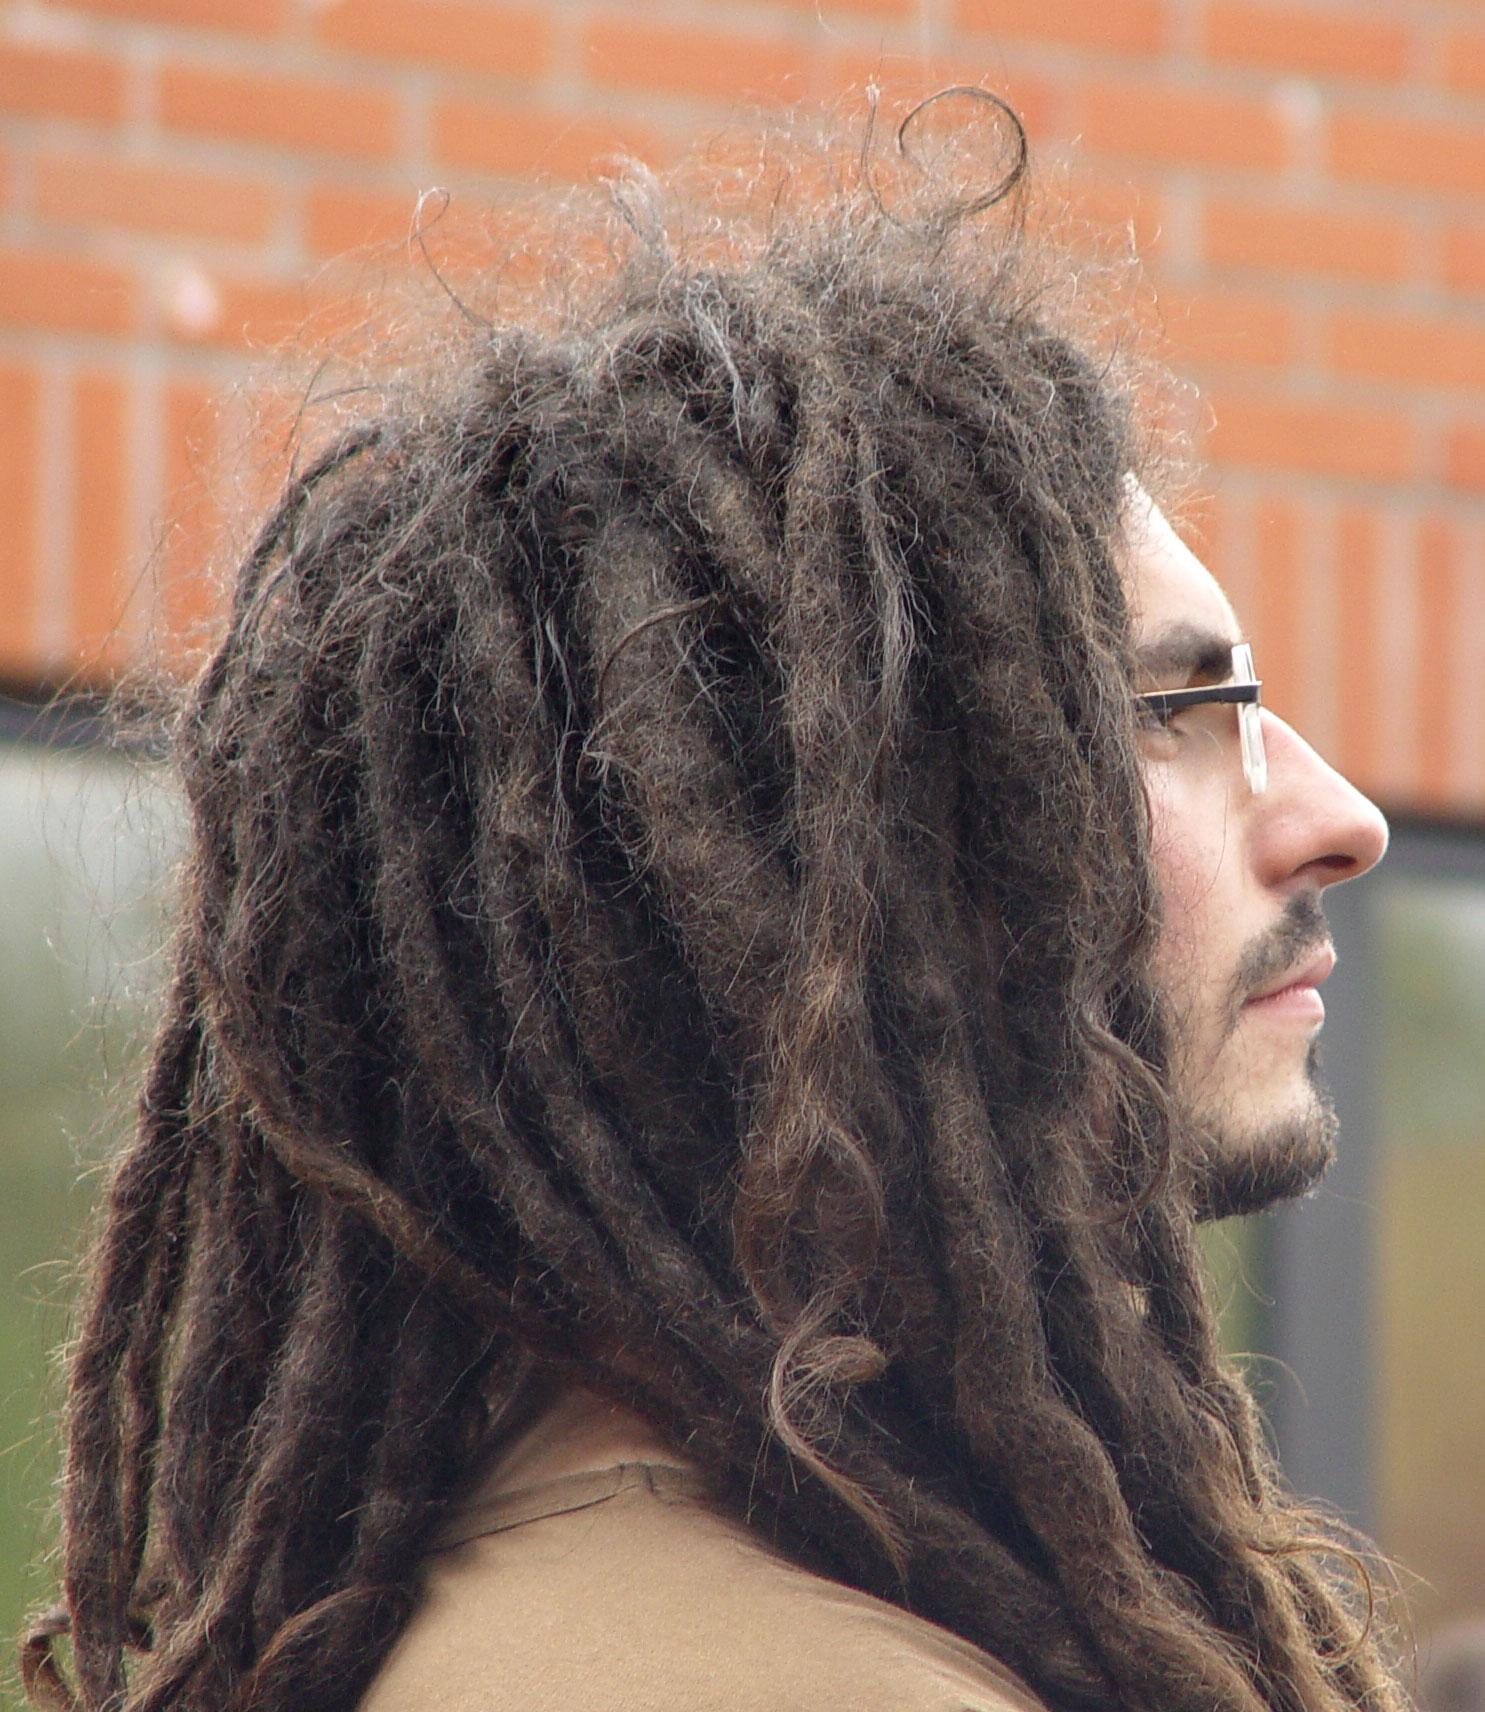 File:Man with dreadlocks.jpg